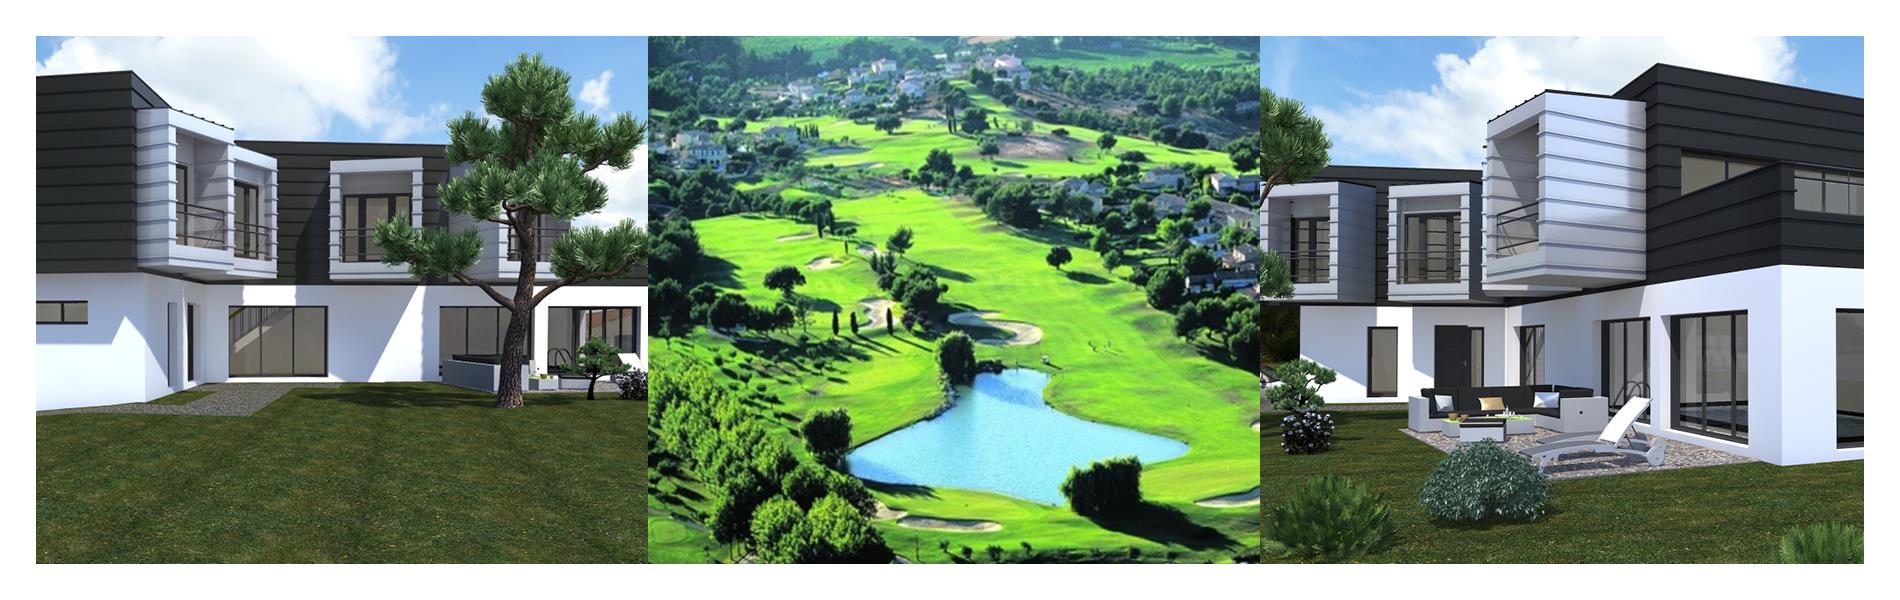 Panorama La Baule Chober Immo Invest